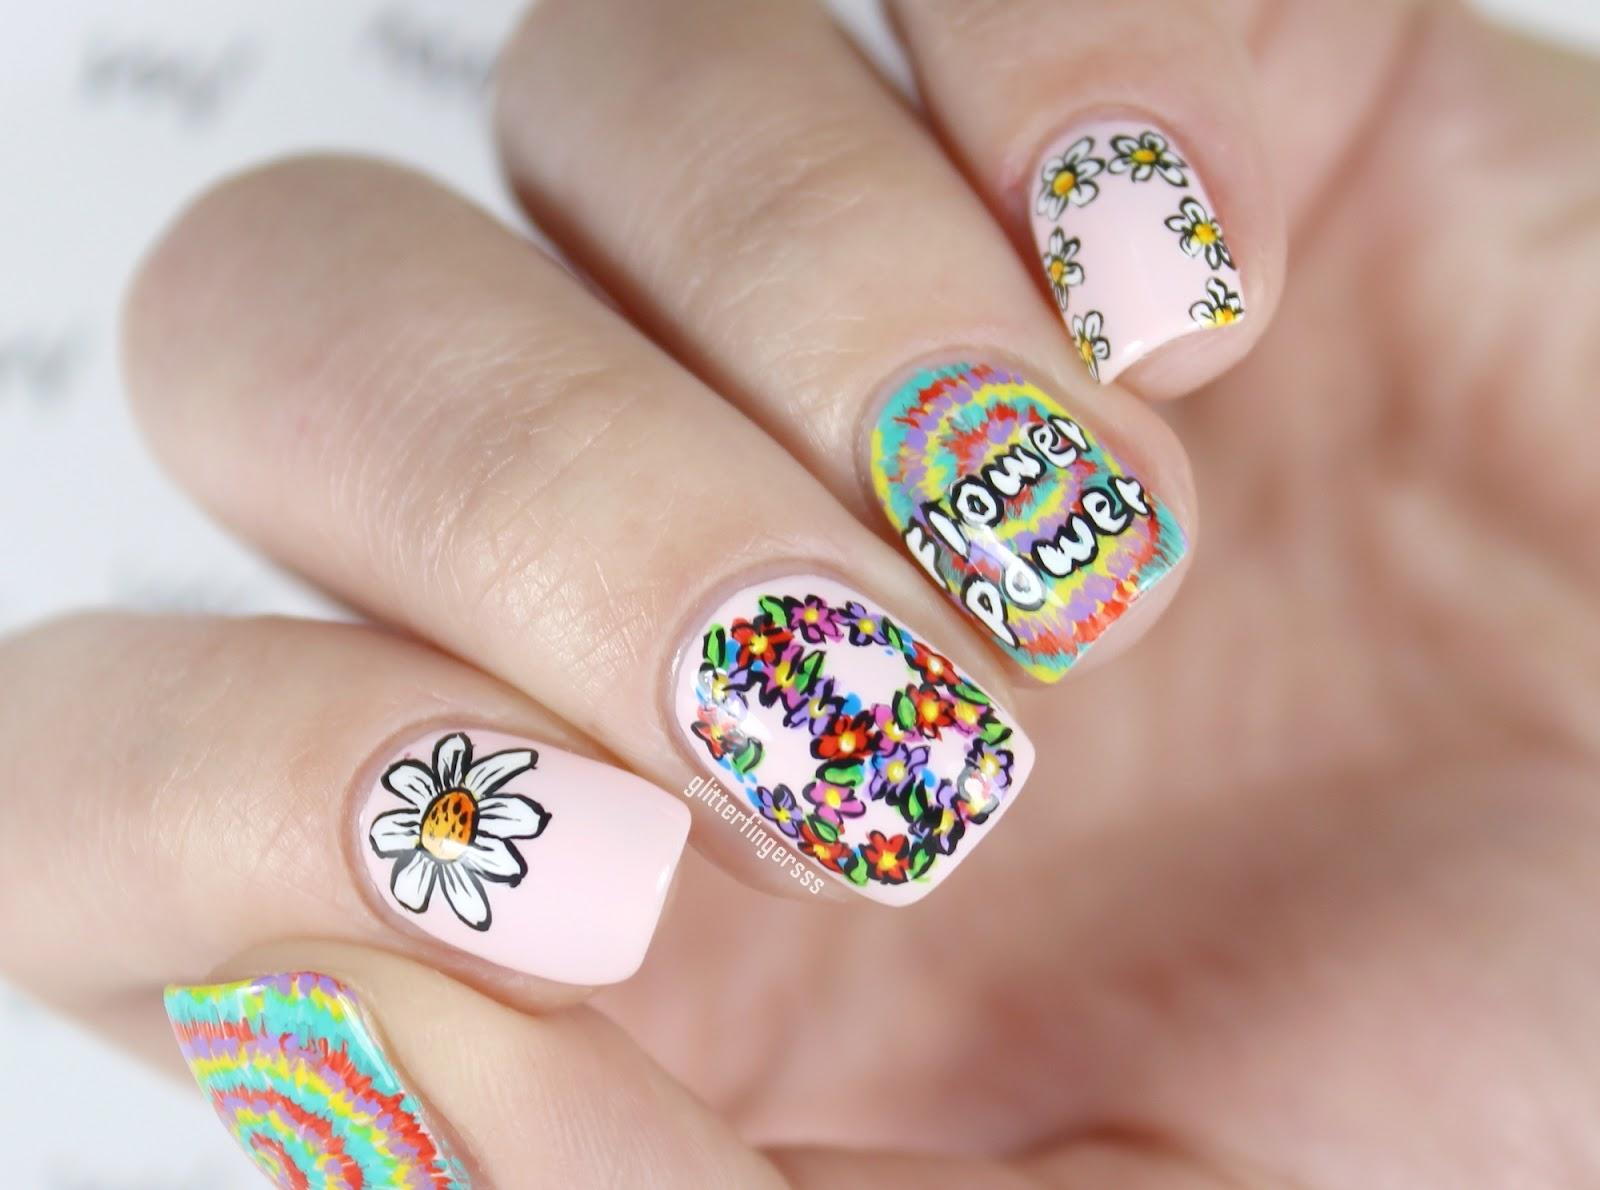 NAIL ART | Hippie ~ Glitterfingersss in english